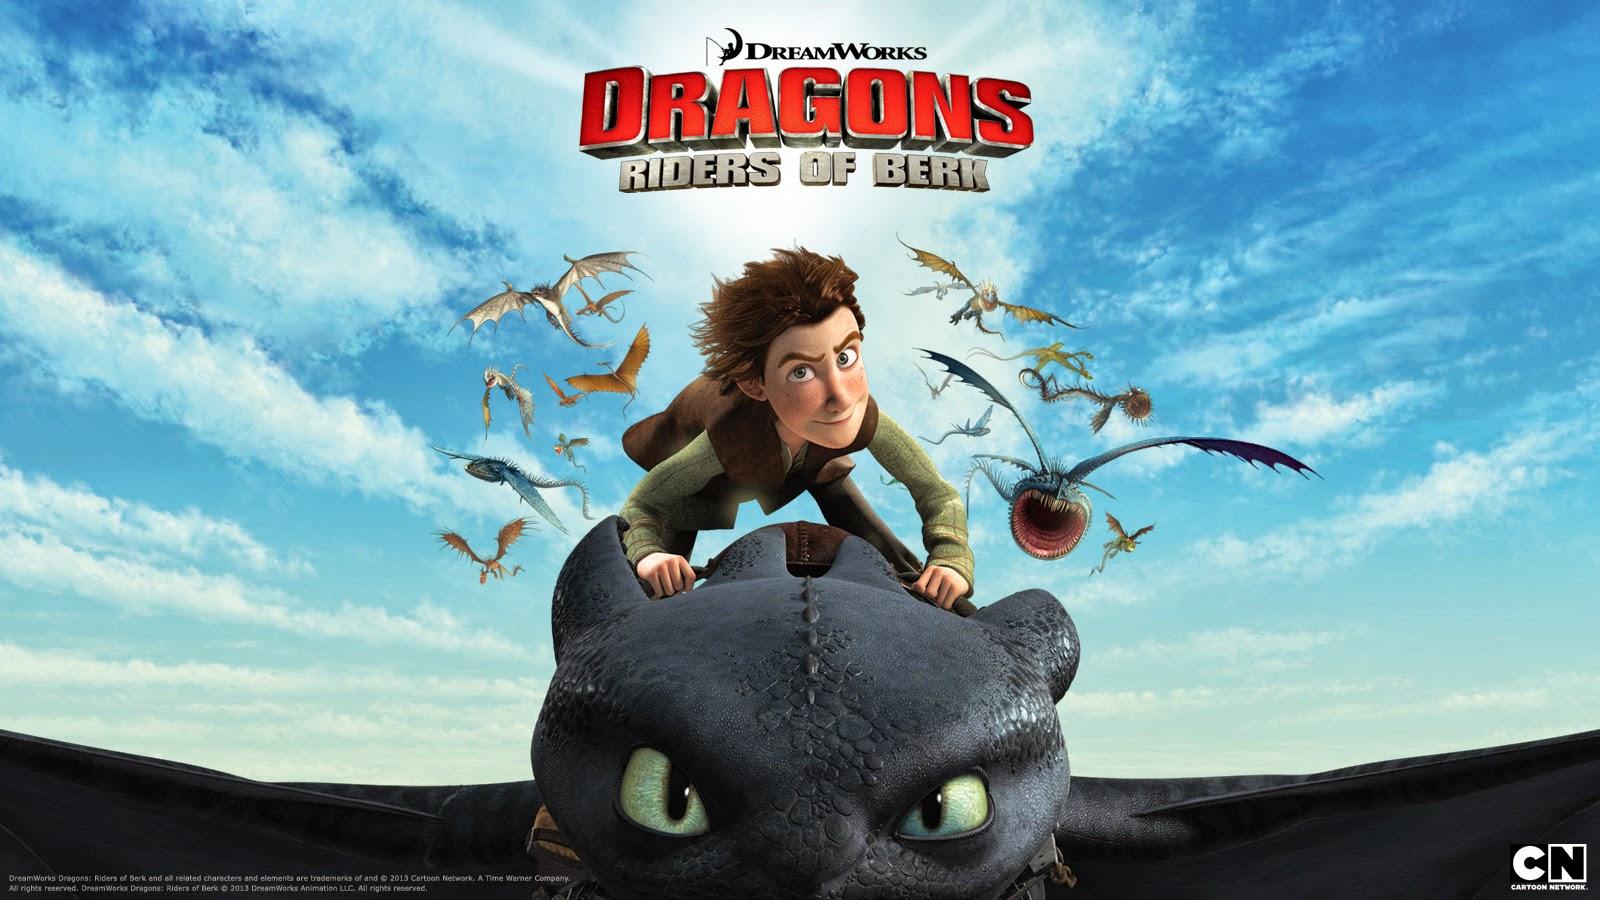 Bild - Dragons-Riders-of-Berk-1600x900-HD-Wallpapers-1.jpg ...